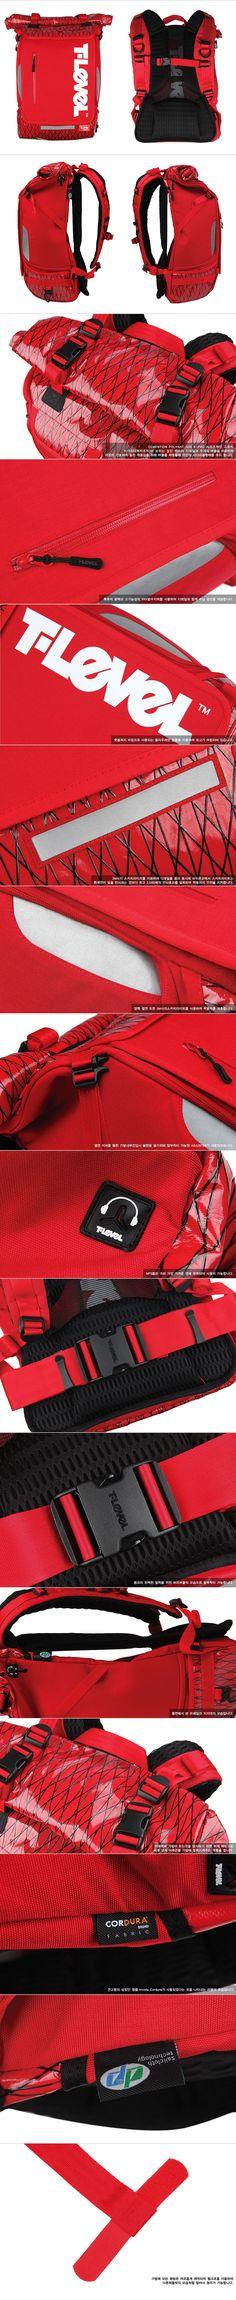 WHEREHOUSE [티레벨 - Infinity Rolltop Backpack X-Pac Red] Brand Information ::T-LEVEL (Technologic-Level)은 현대를 살아가는 도시인들의 라이프스타일을 베이스로 단순히 하나의 카테고리에 속하지않으며, 다방면의 모든 유저들을 위하여 설계된 어반 러기지 컬렉션 (Urban Luggage Collection)을 컨셉으로 프로듀싱된브랜드입니다. 픽시 기어 바이크, BMX 그리고 이지바이크등의 일상생활에서 가장 가까운 라이딩기어에 포커스를 맞춘 프로덕트를포함하며, 넓게는 나이와 성별, 직업이 다양한 모든 도시인들의 생활패턴에 맞춘 각종 Bag과 그에 따른 어플리케이션을 제공합니다.Product Information ::T-LEVEL X-PAC 시리즈 제품 중 하나로 Demension Polyant사에서 발주한 경량성과 내구성, 방수성을 자랑하는 X-Pac원단을 사용하여 제작된 Infinity…